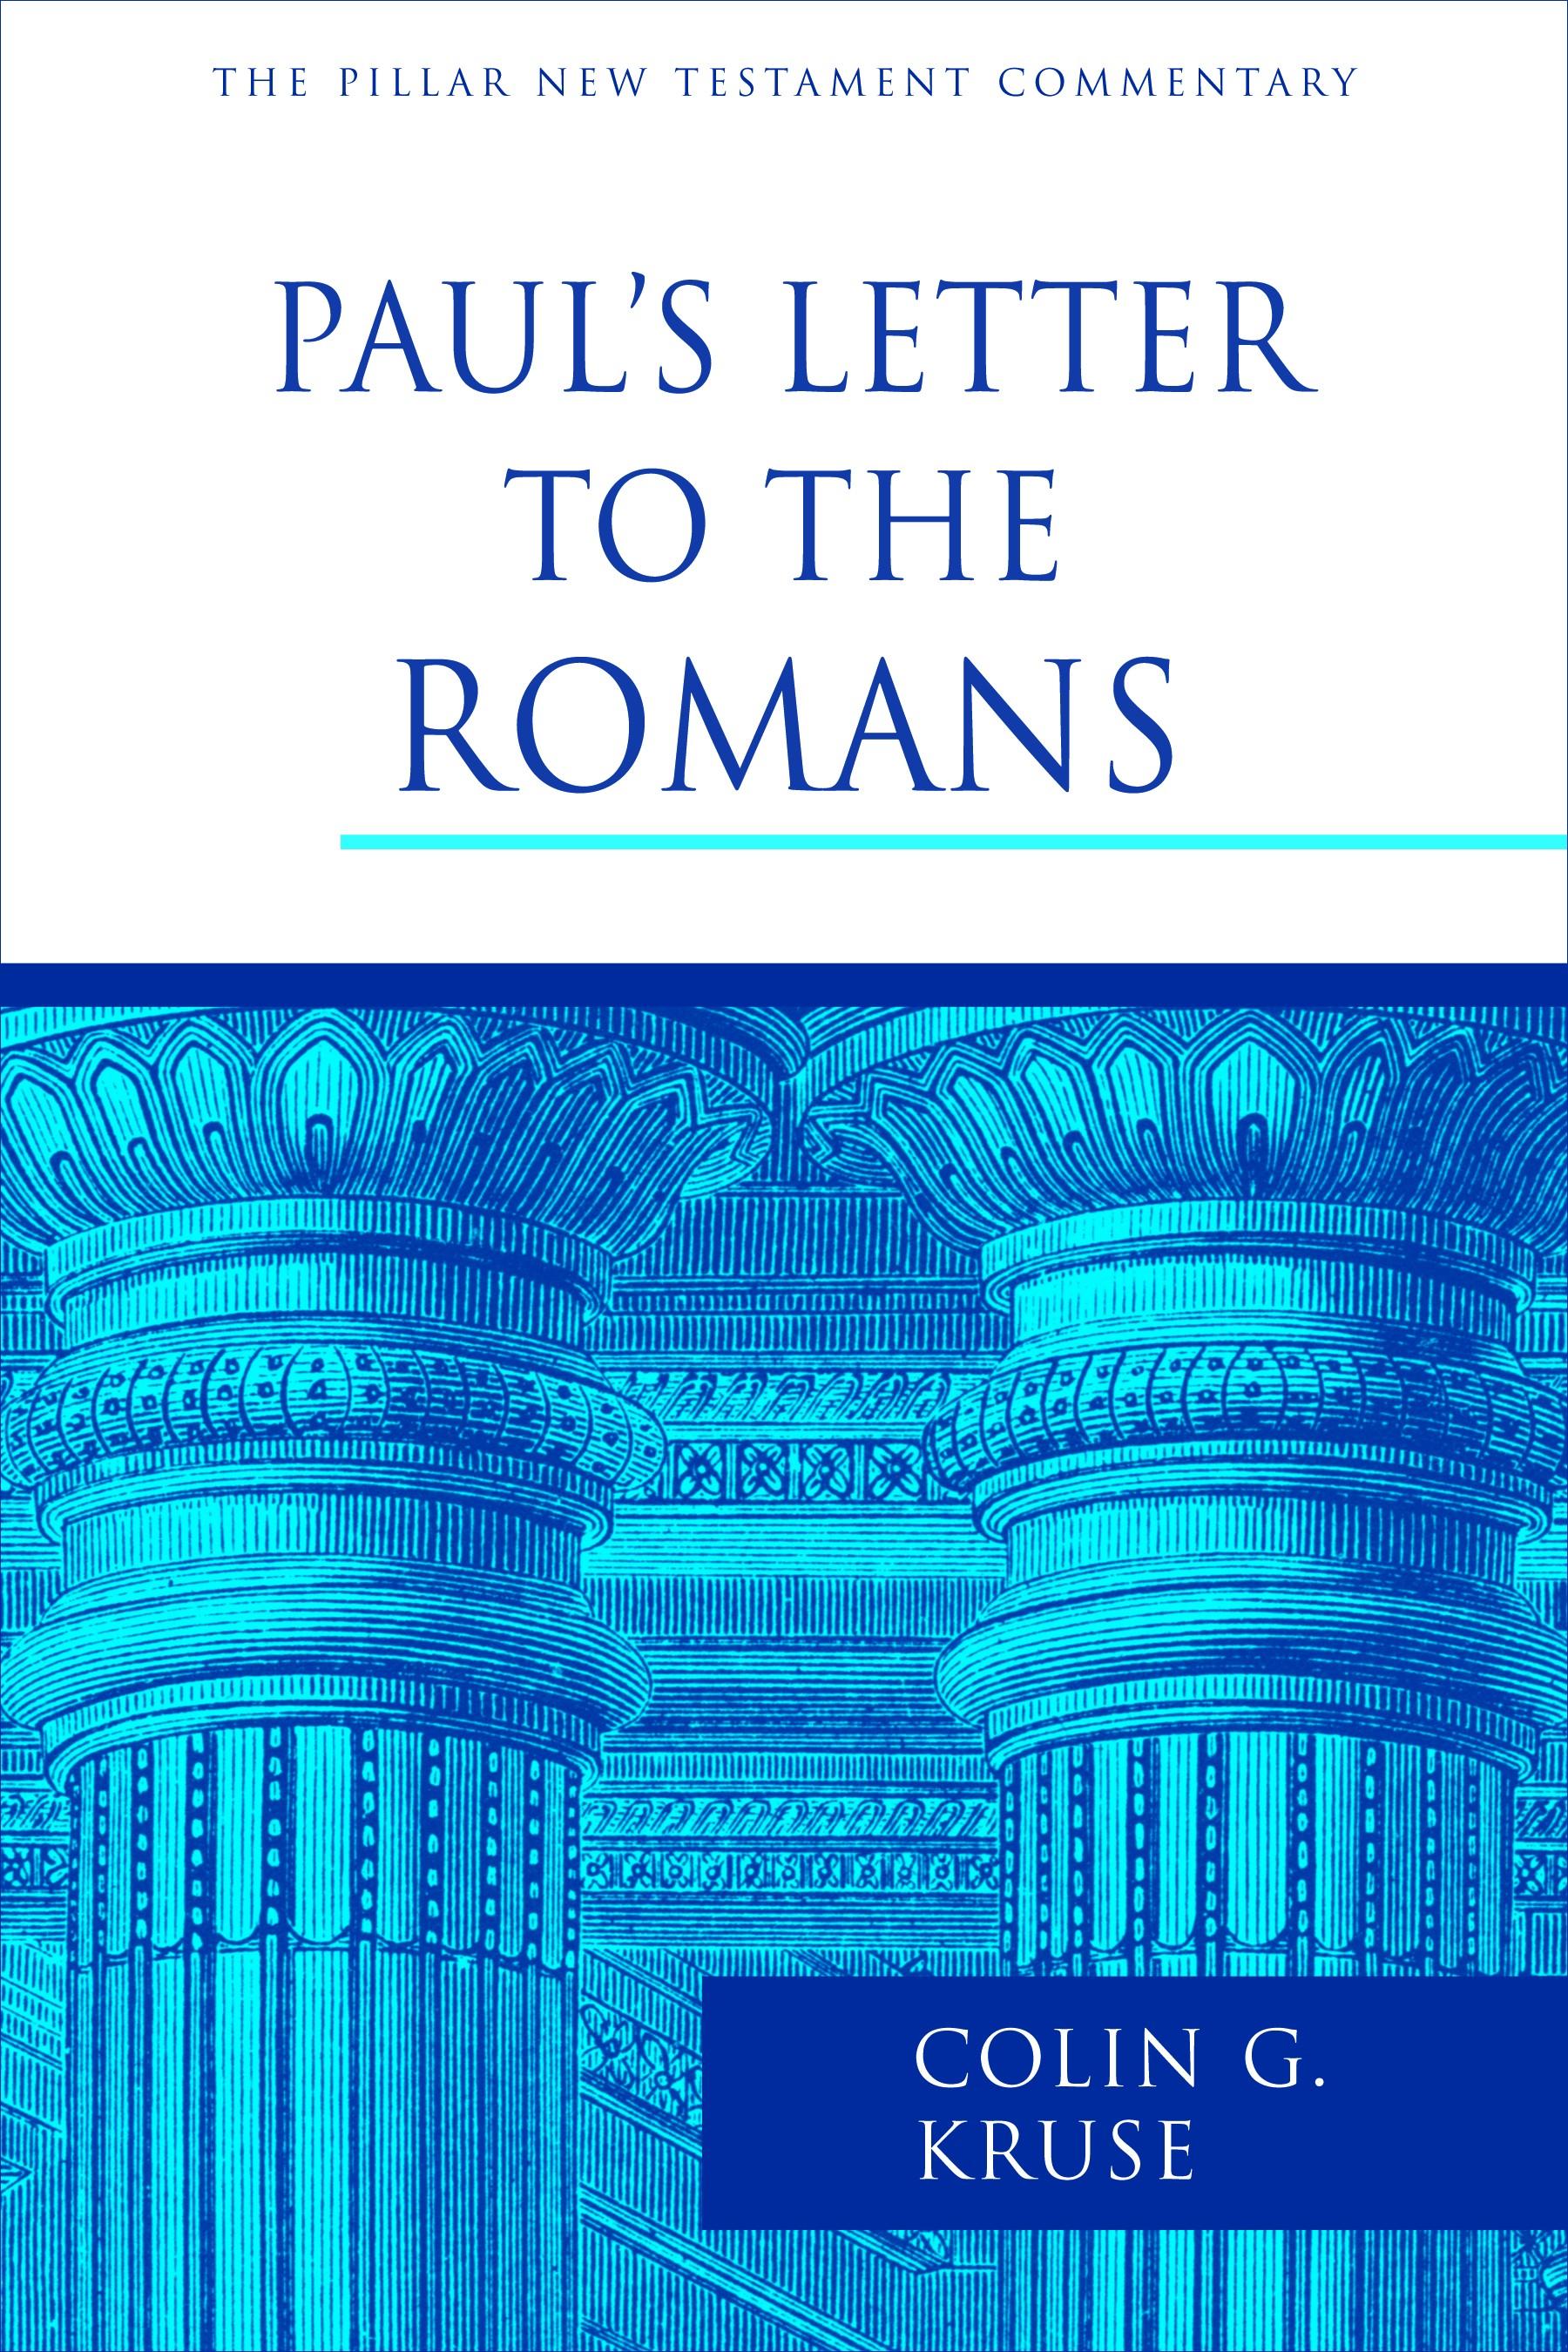 Paul's Letter to the Romans - Colin G. Kruse : Eerdmans